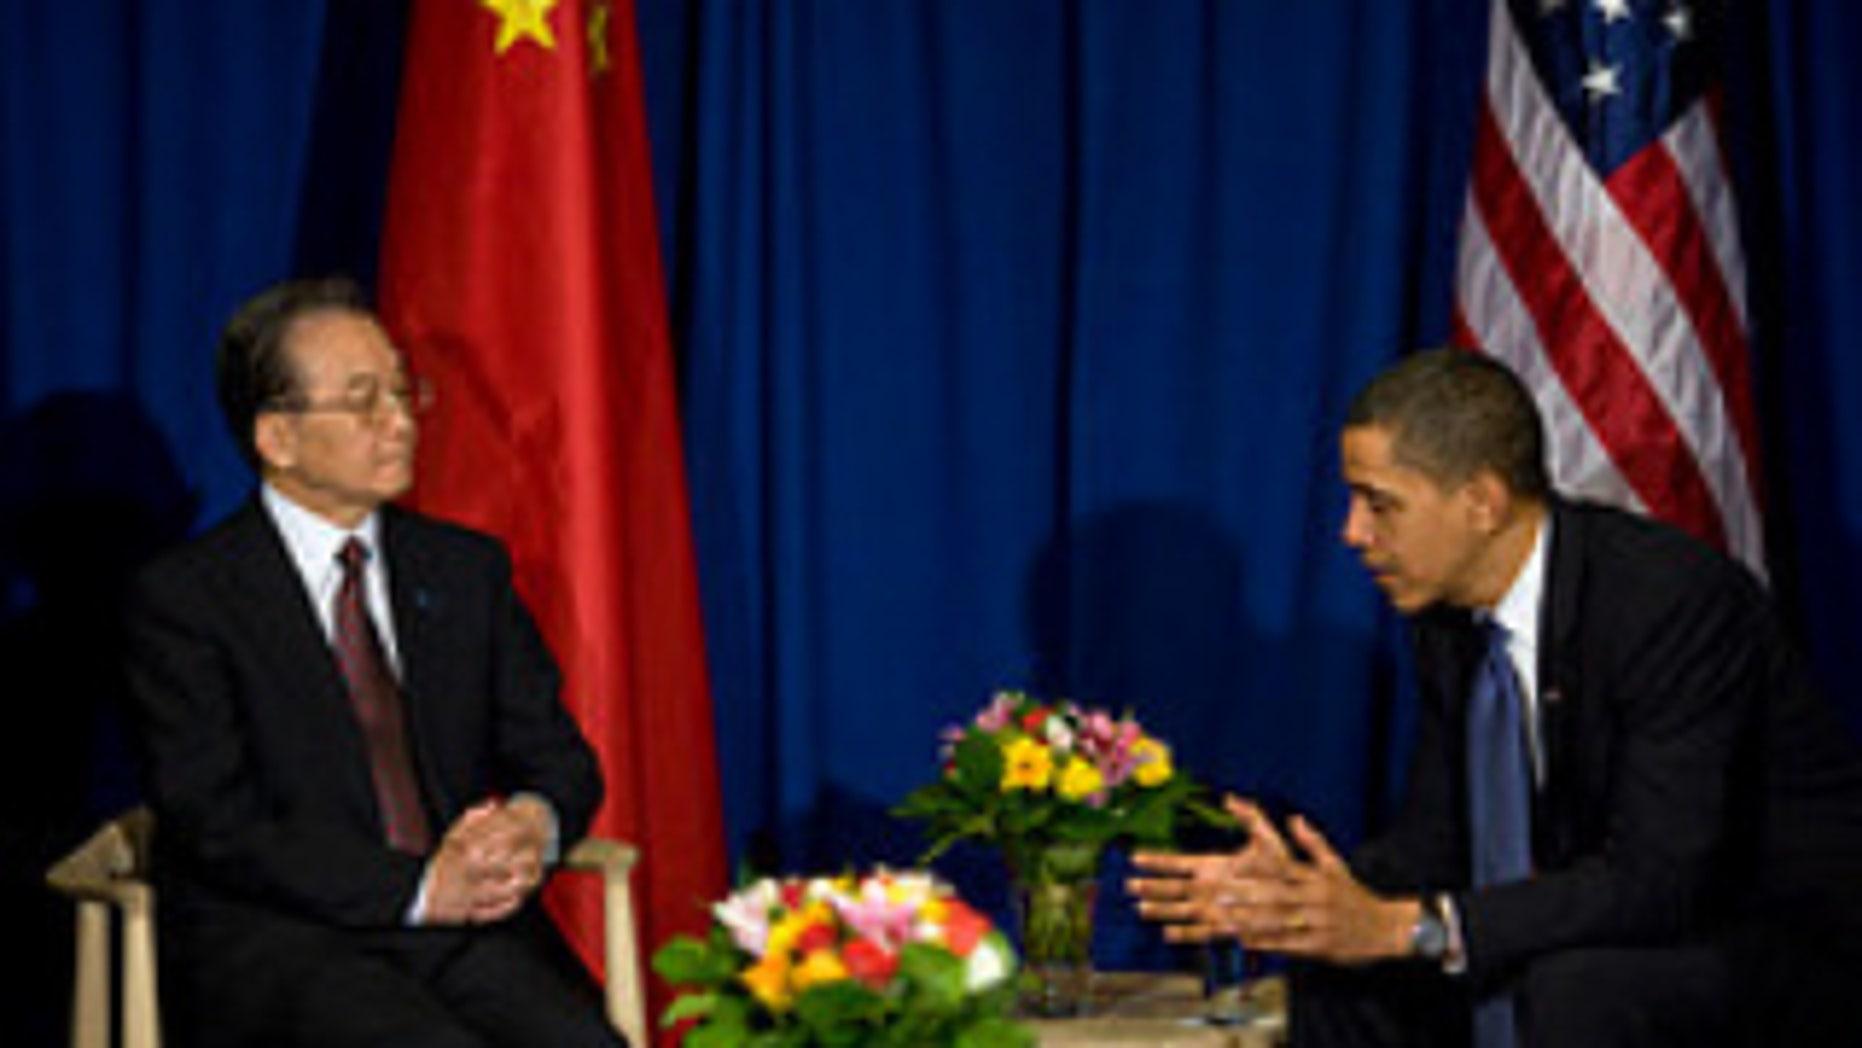 President Obama and Chinese Premier Wen Jiabao. White House Photo.